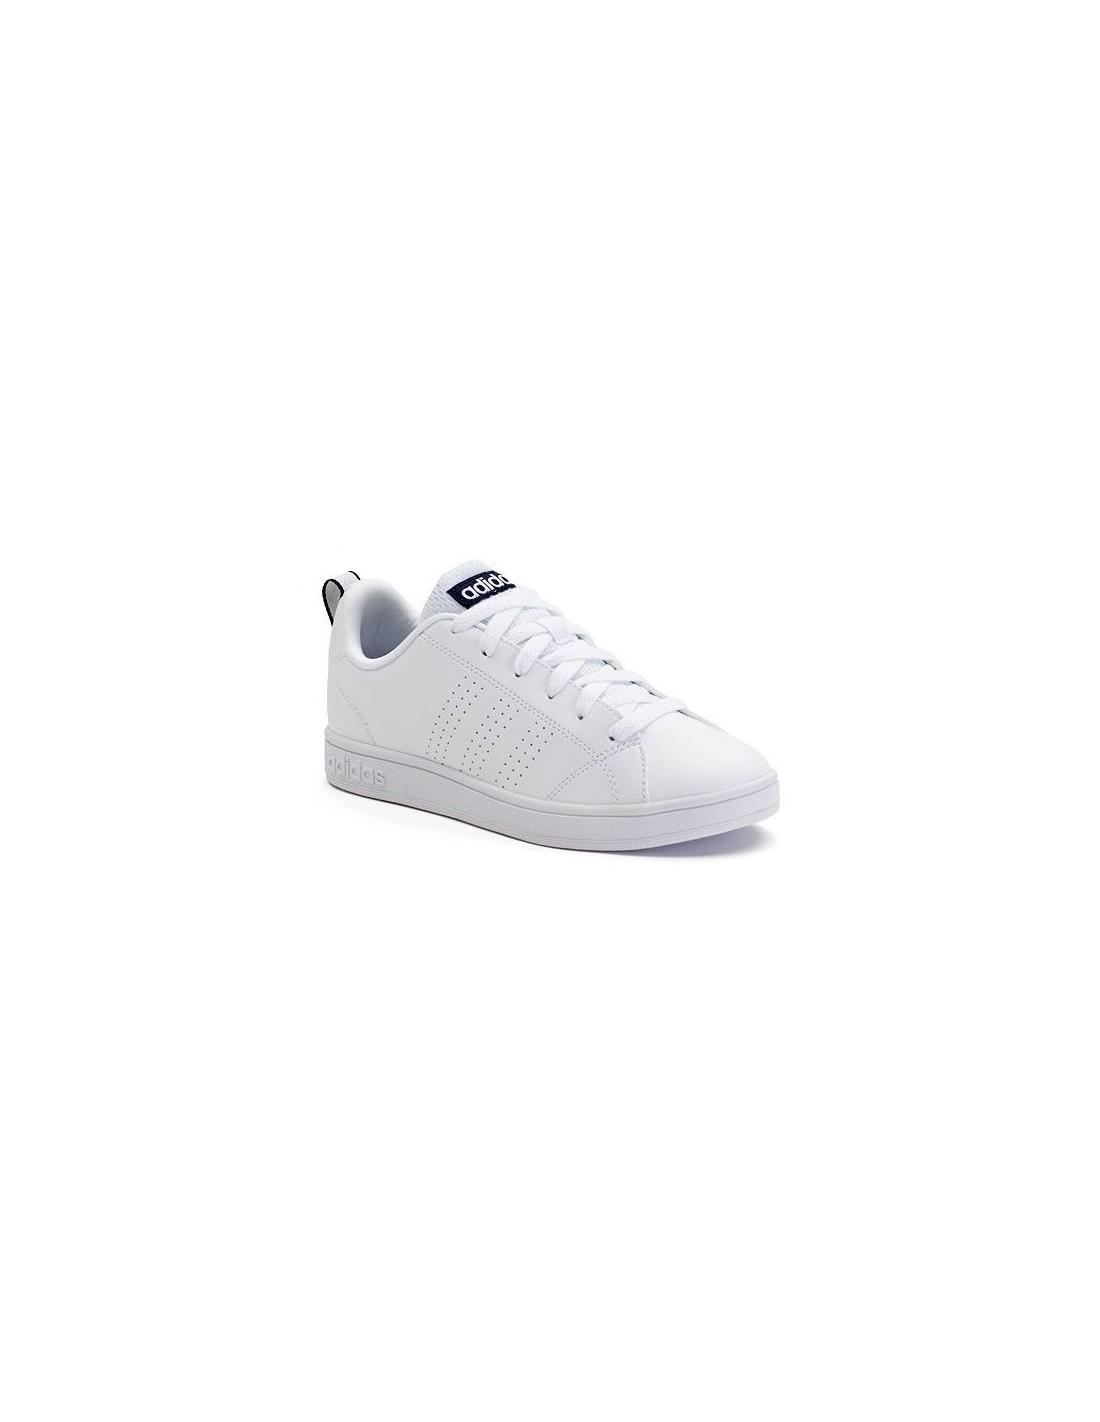 b0c2431c8821 Adidas Advantage Clean VS